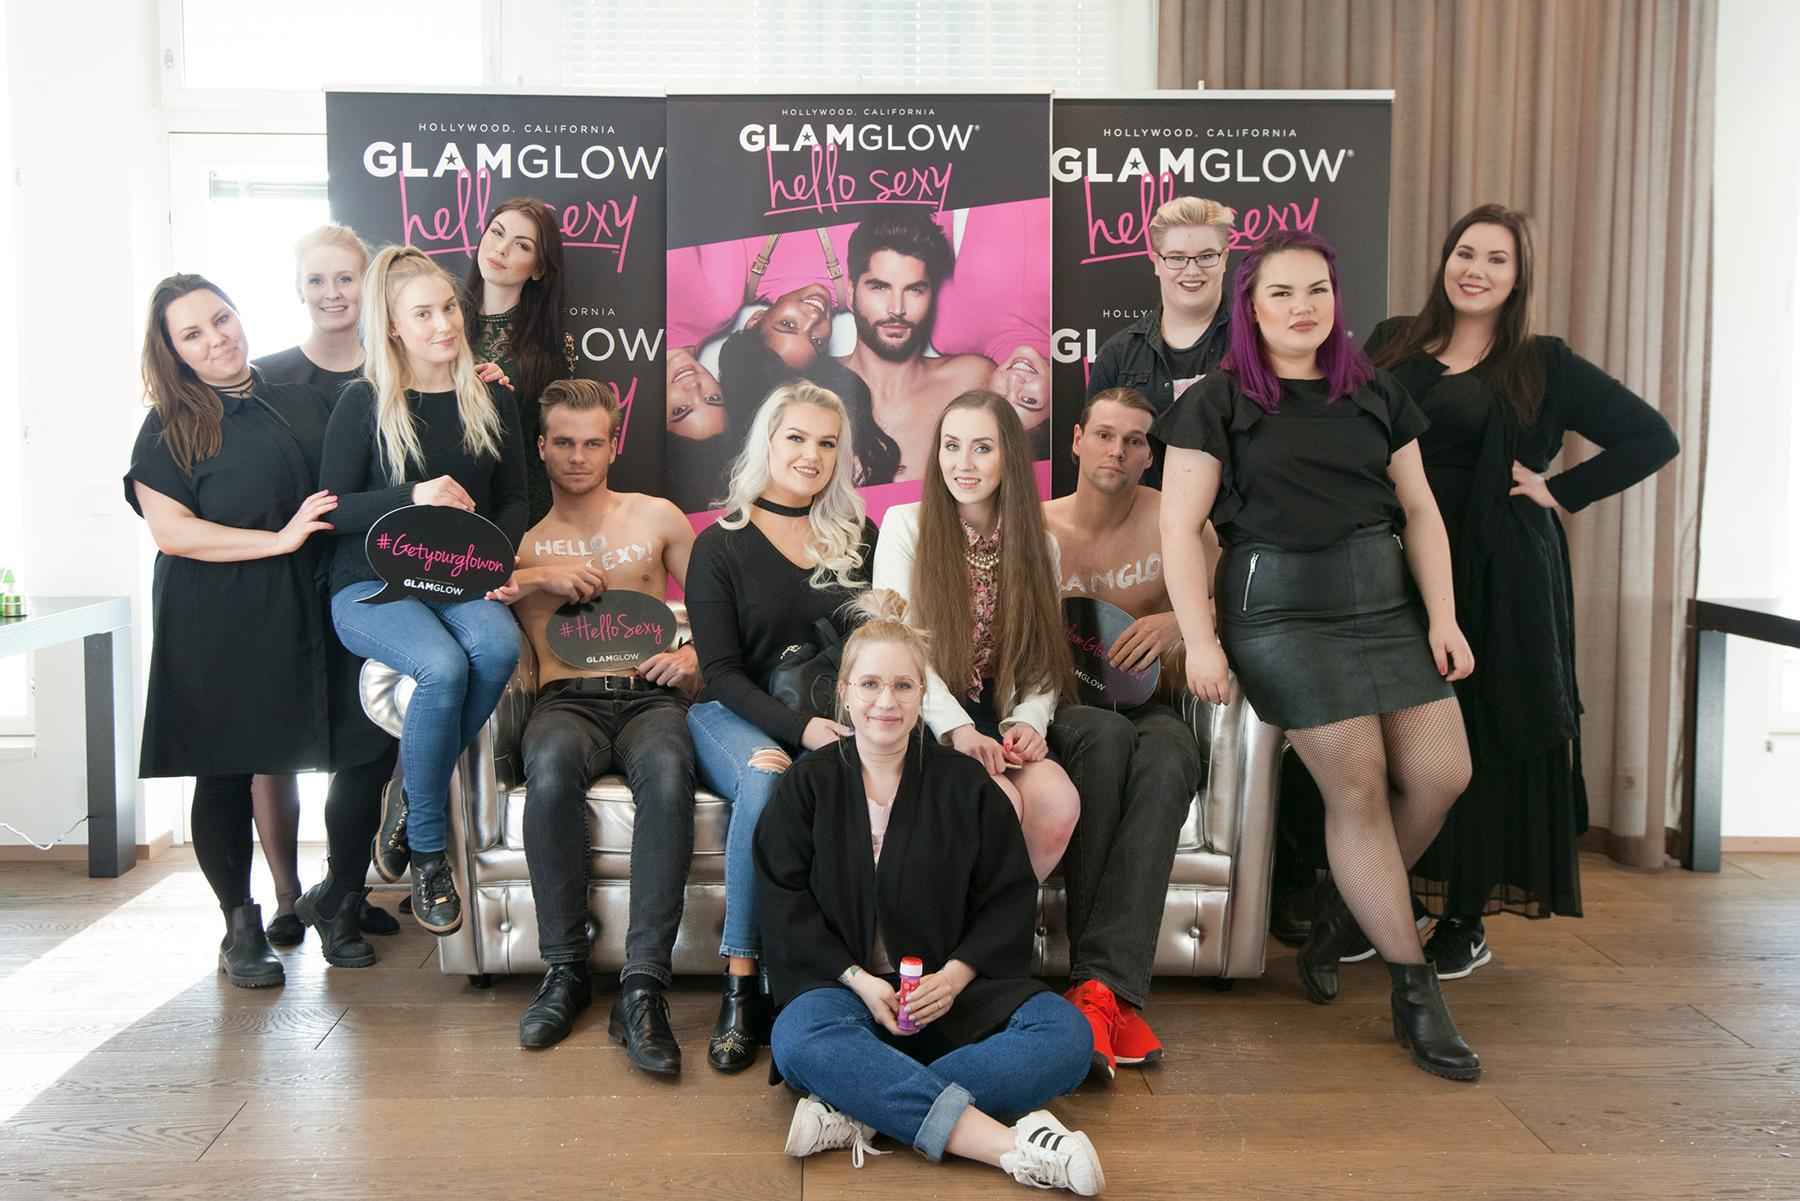 1 glamglow 11.5.2017 pr tapahtuma helsinki bloggaajat successstory pr